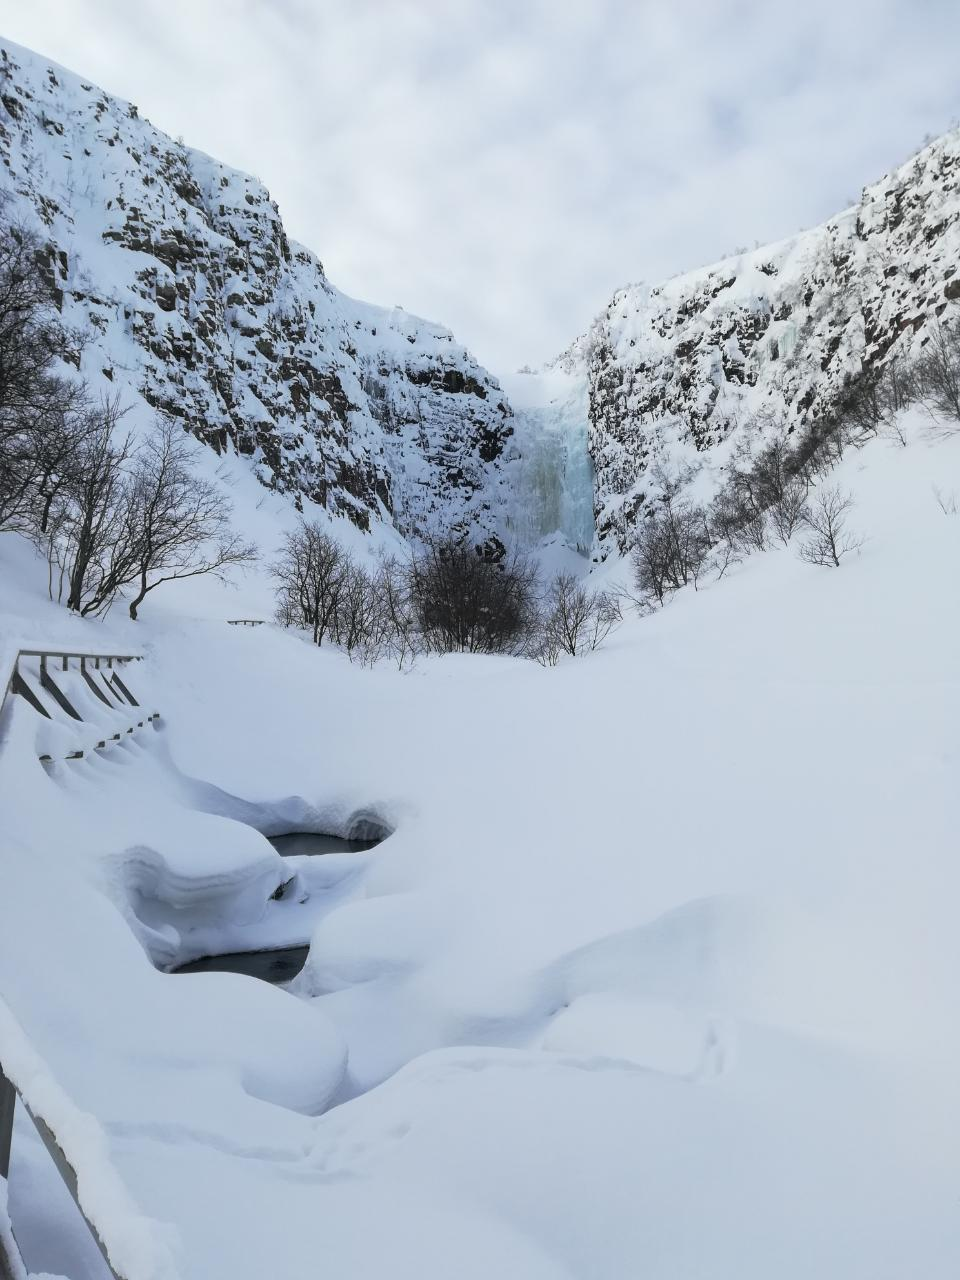 Njupeskär Wasserfall im Winter